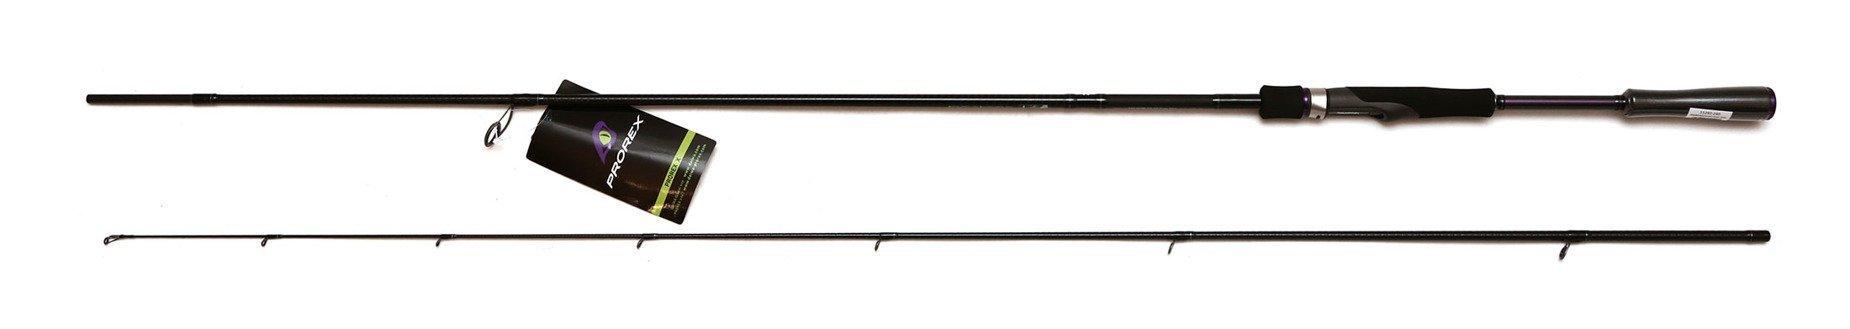 Daiwa Prorex X Drop Shot  240cm 5-21g